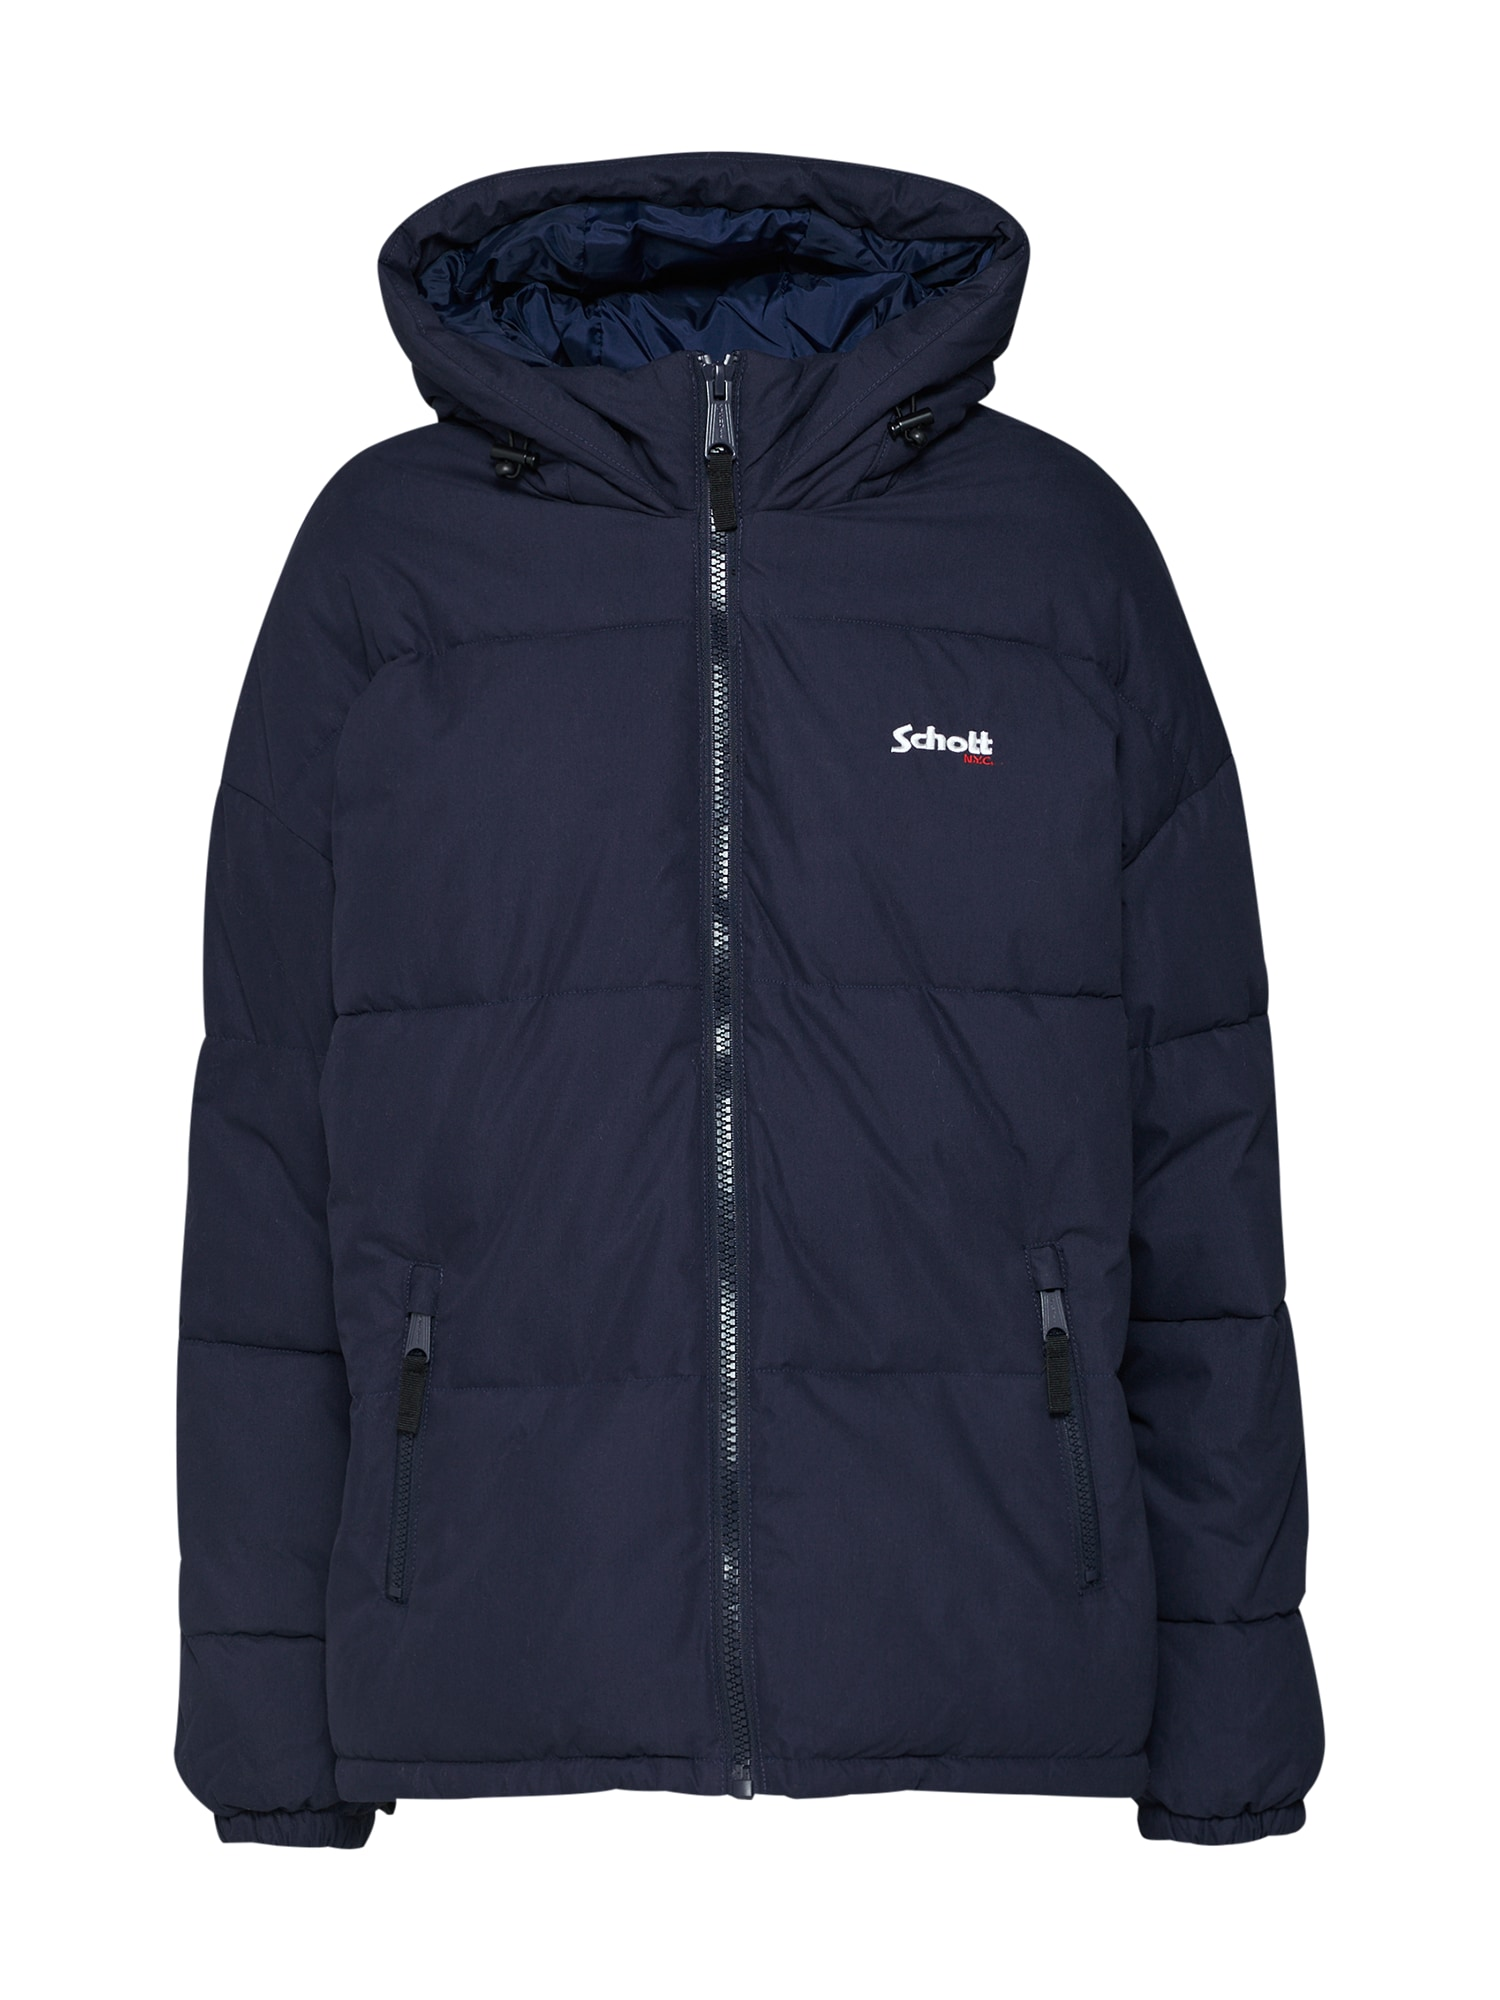 Schott NYC Žieminė striukė 'JKT Alaska' tamsiai mėlyna